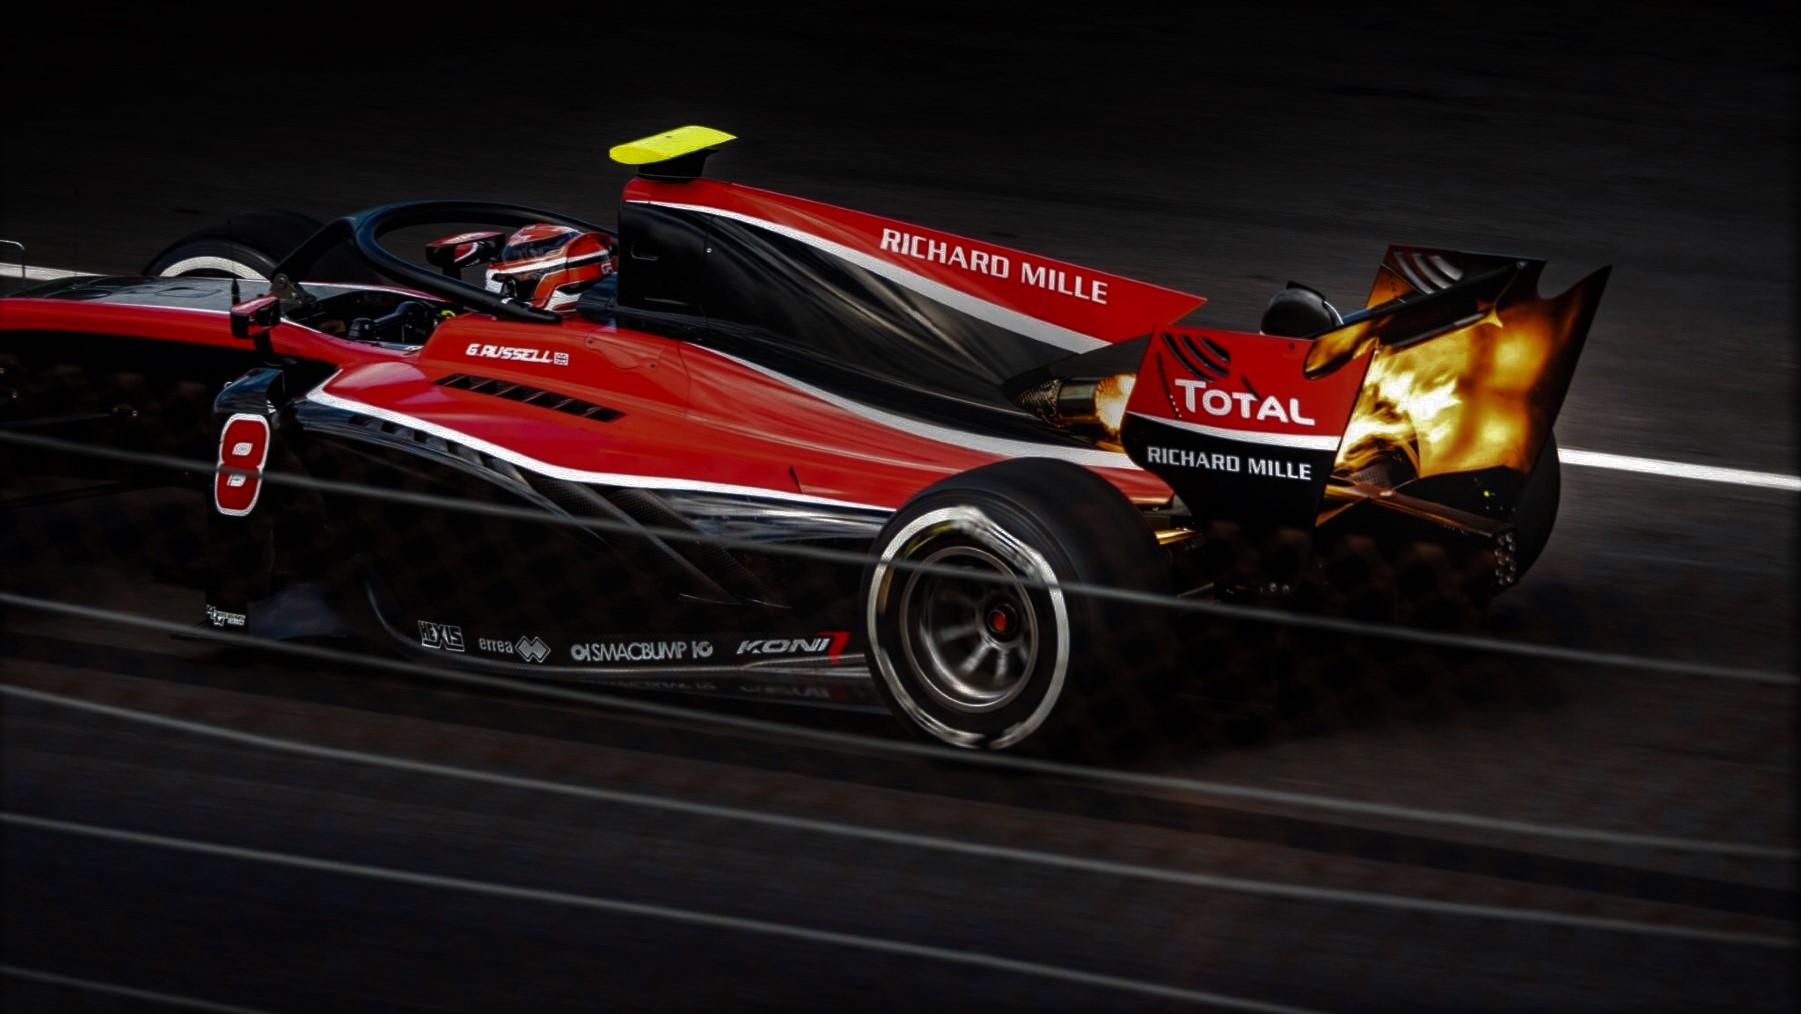 Vietnam to host Formula 1 Grand Prix in 2020